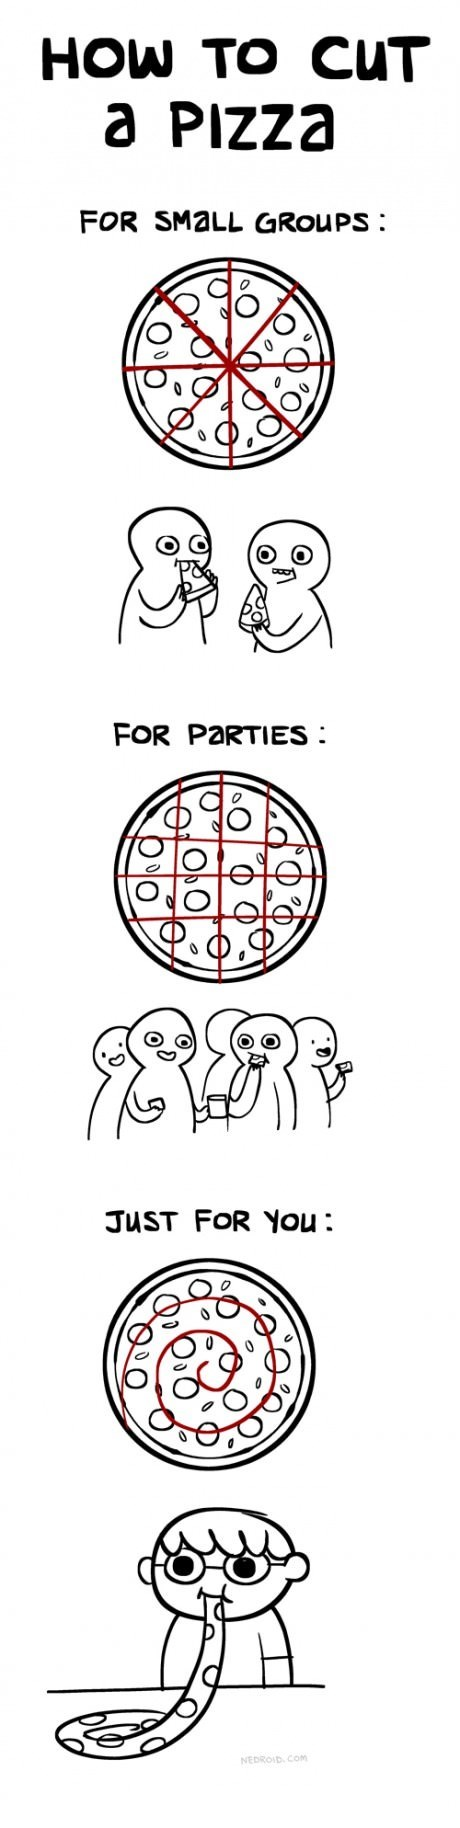 pizza guides web comics - 8139393024